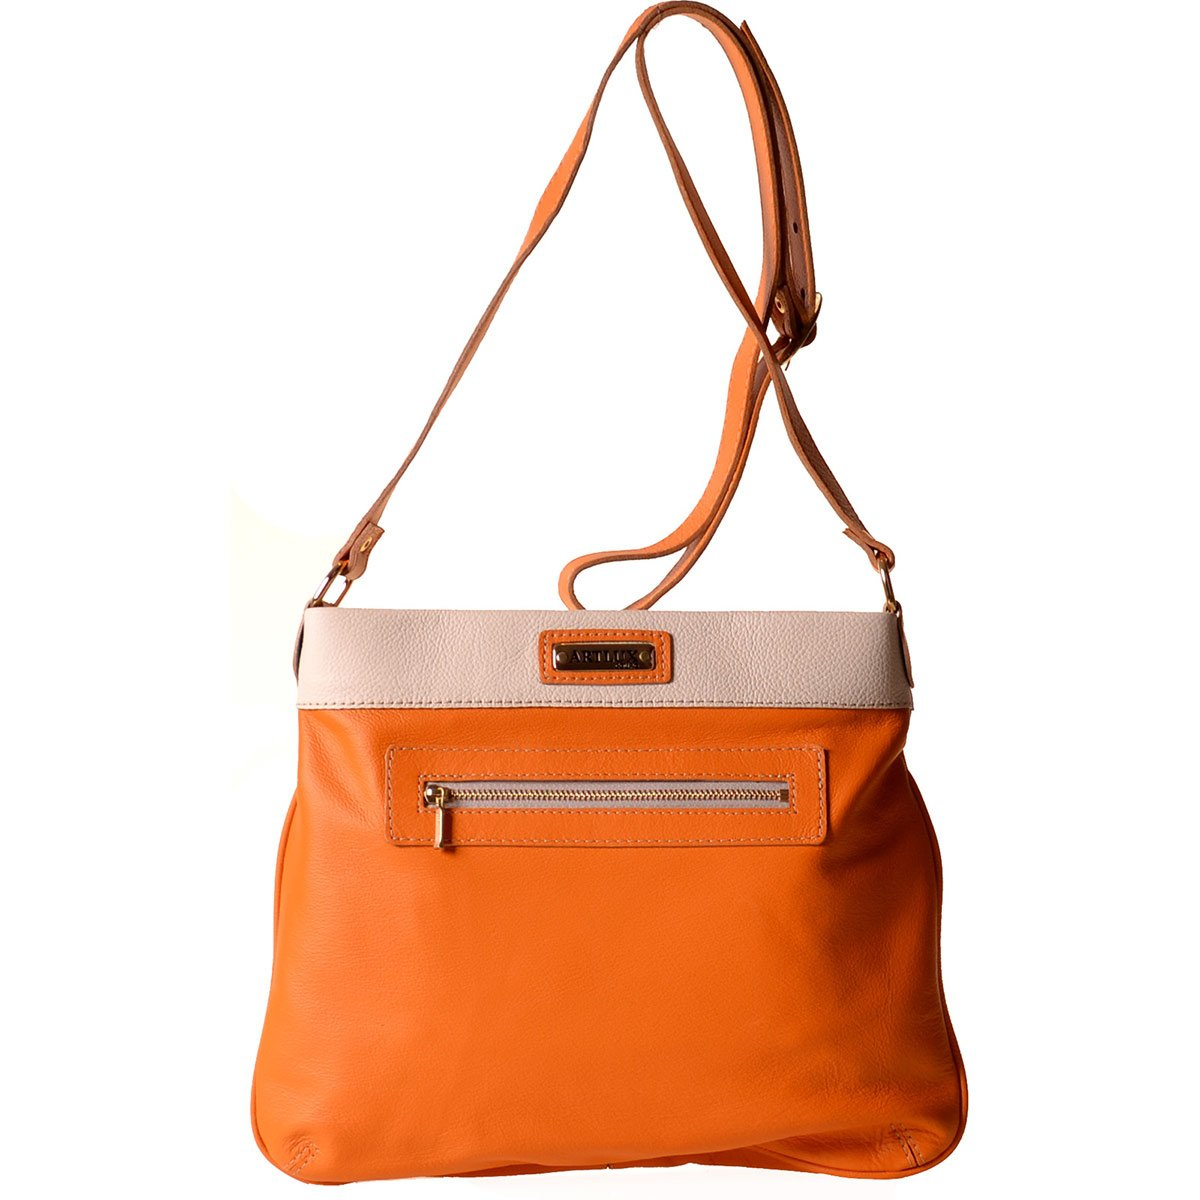 818a26032 Bolsa Feminina Transversal 8057 - Laranja - Compre Agora